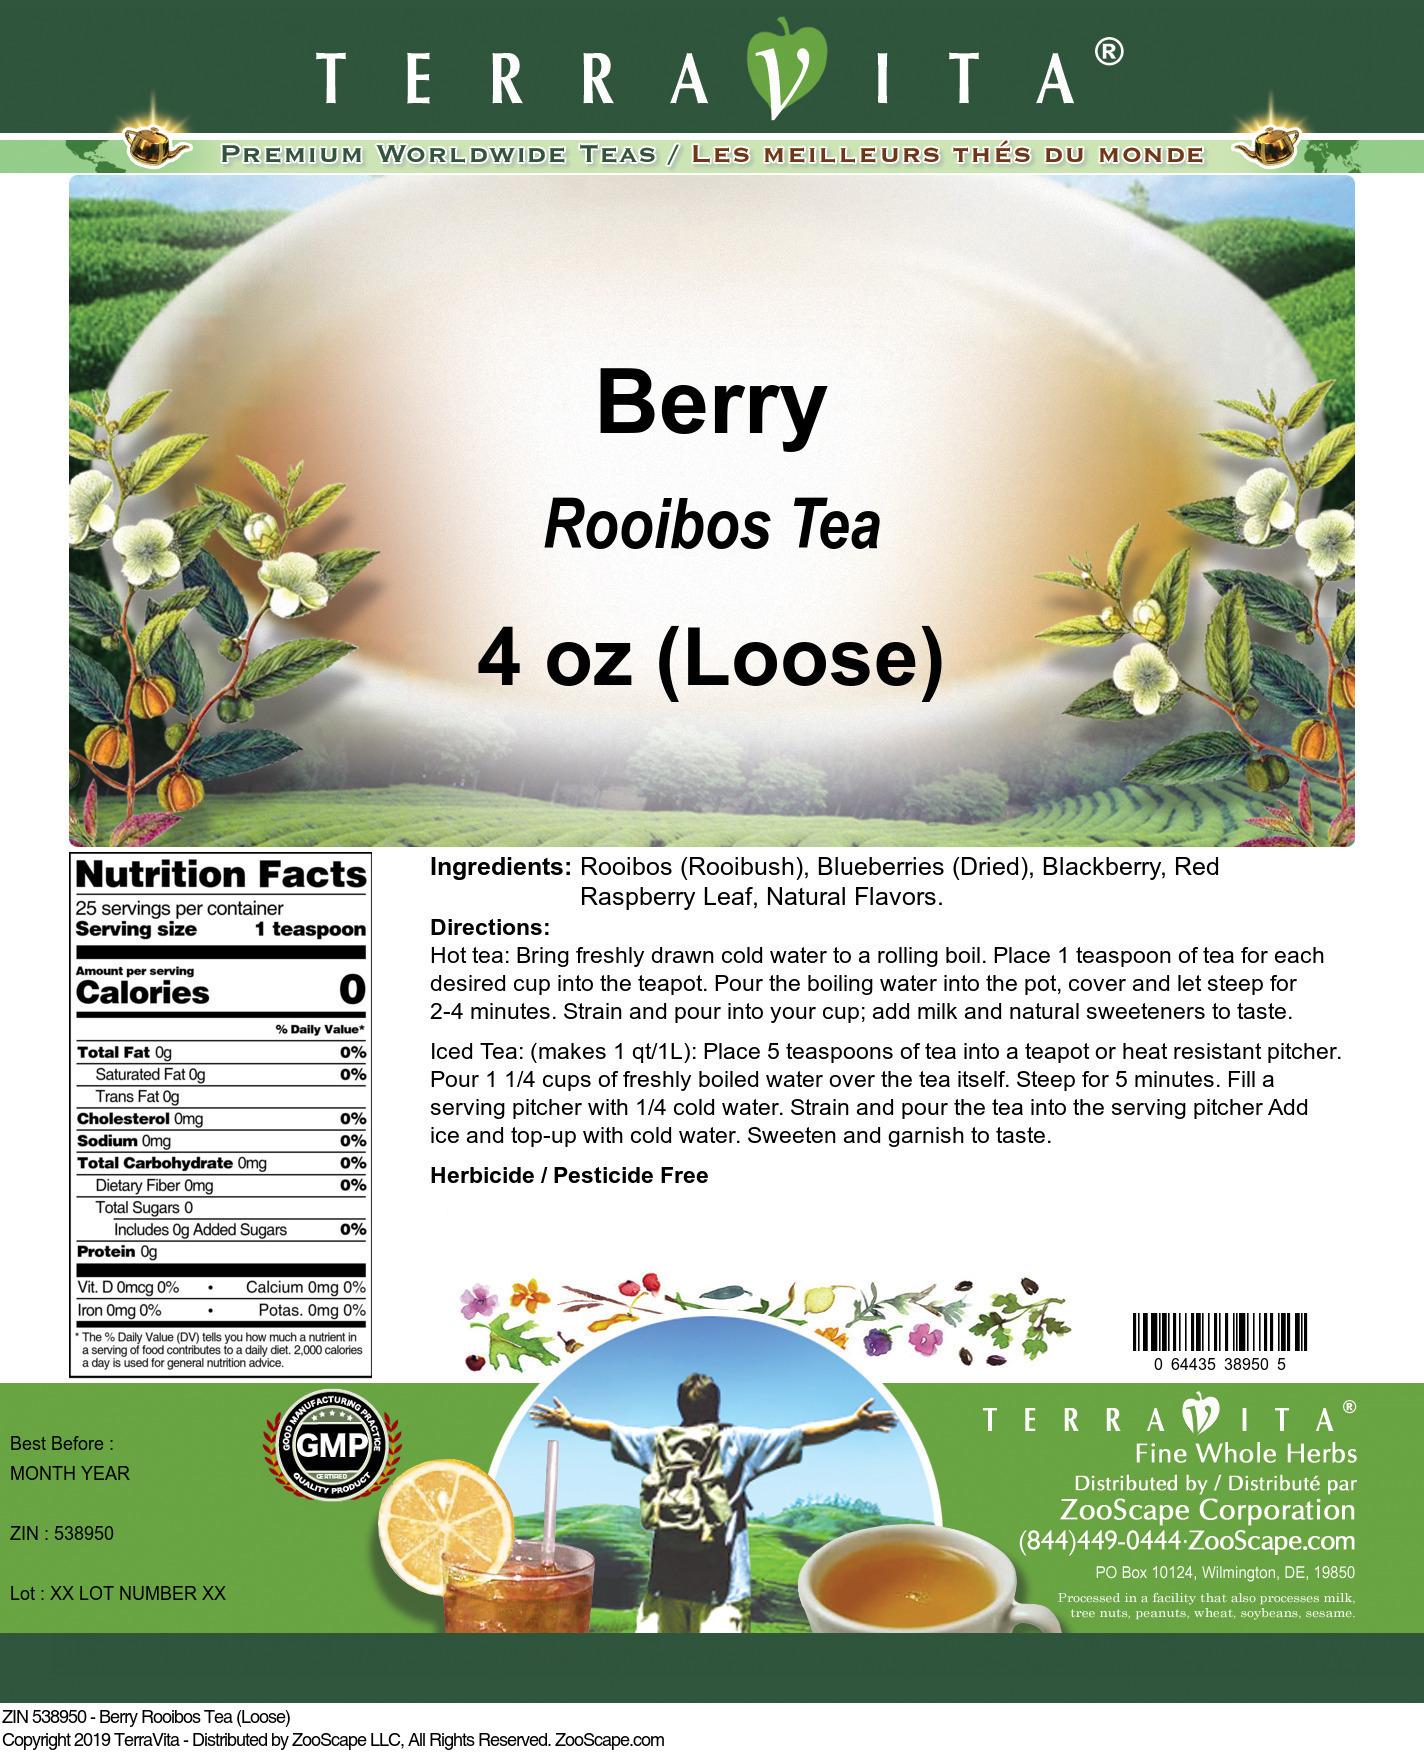 Berry Rooibos Tea